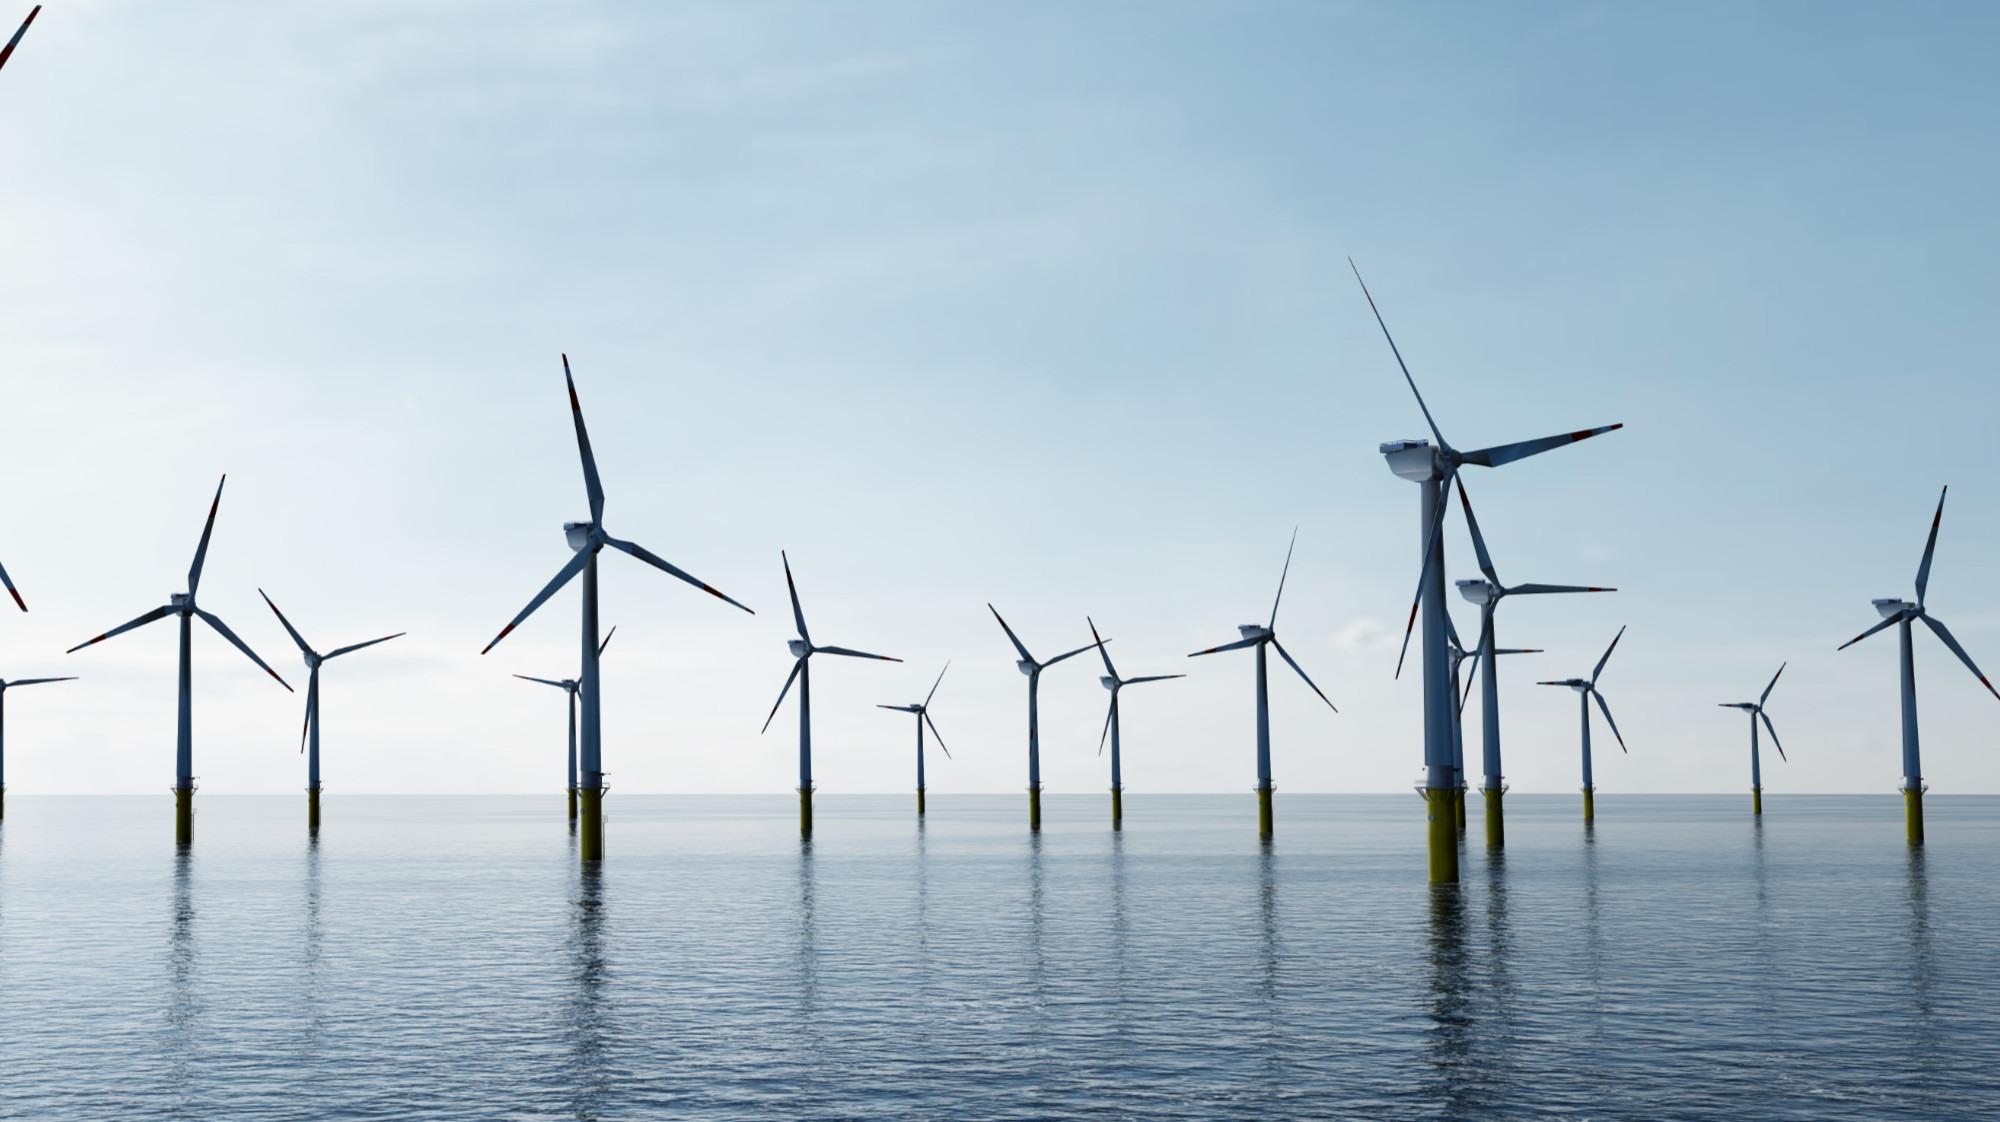 offshore wind turbines on ocean